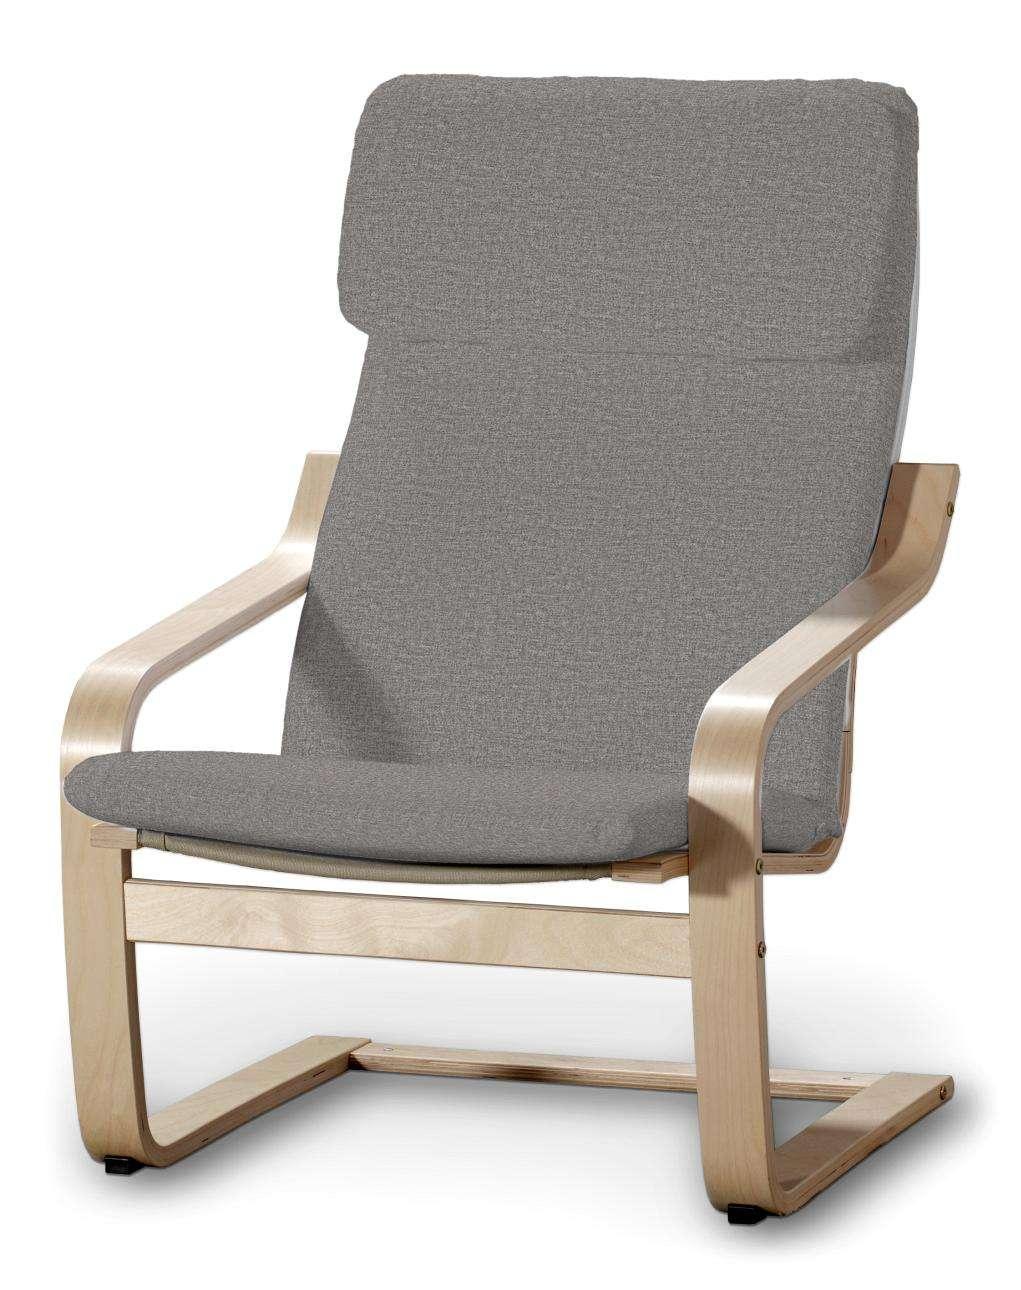 Poduszka na fotel Poäng w kolekcji Edinburgh, tkanina: 115-81